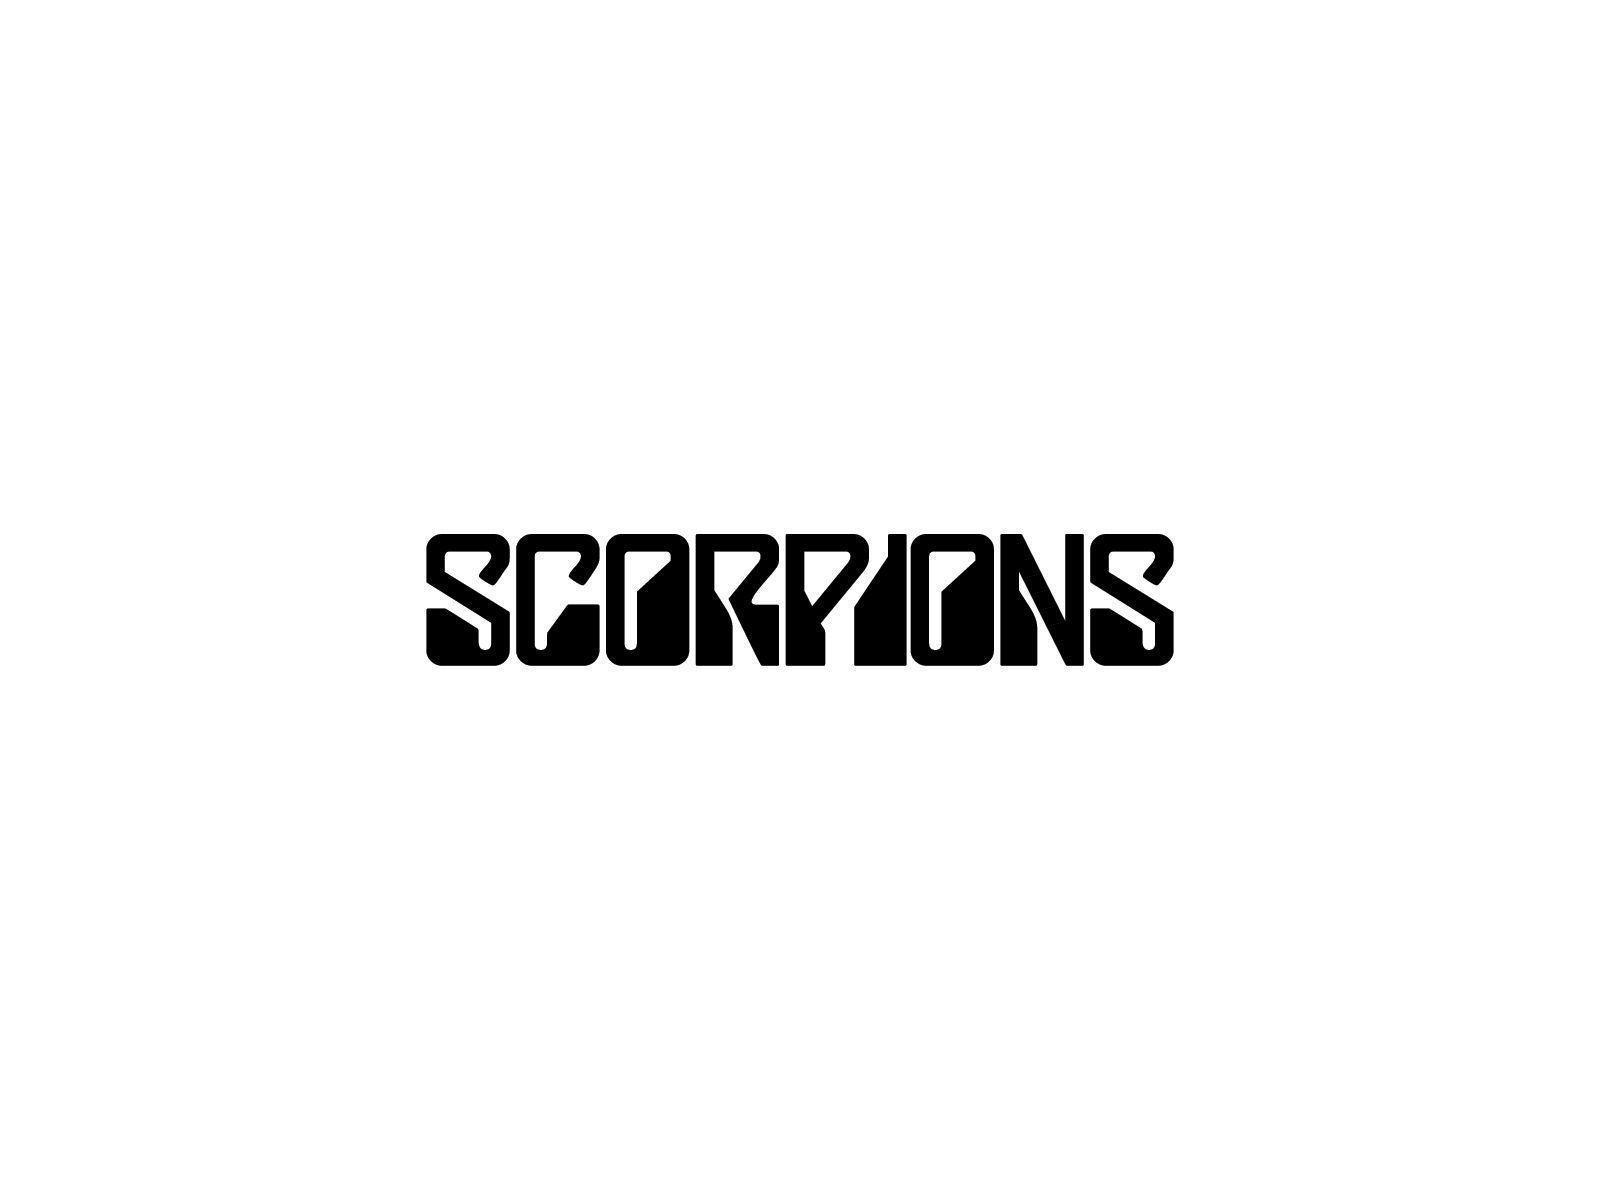 The animals band logo scorpions band logo - Scorpions Logo And Wallpaper Band Logos Rock Band Logos Metal